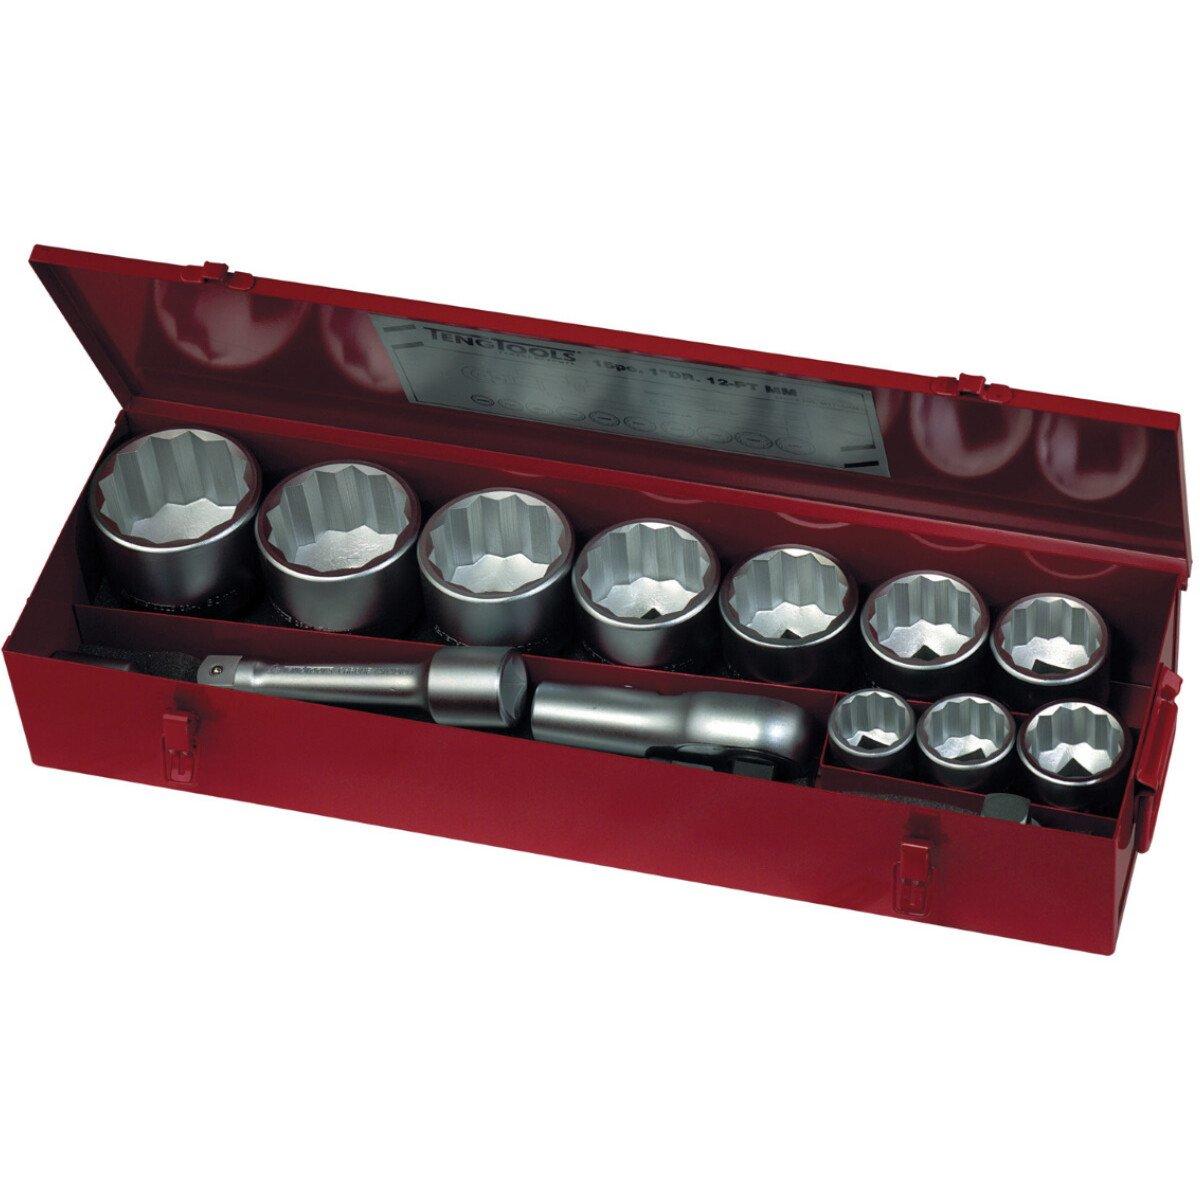 "Teng Tools M1115MM 15 Piece 1"" Drive 12 Point Metric Socket Set"